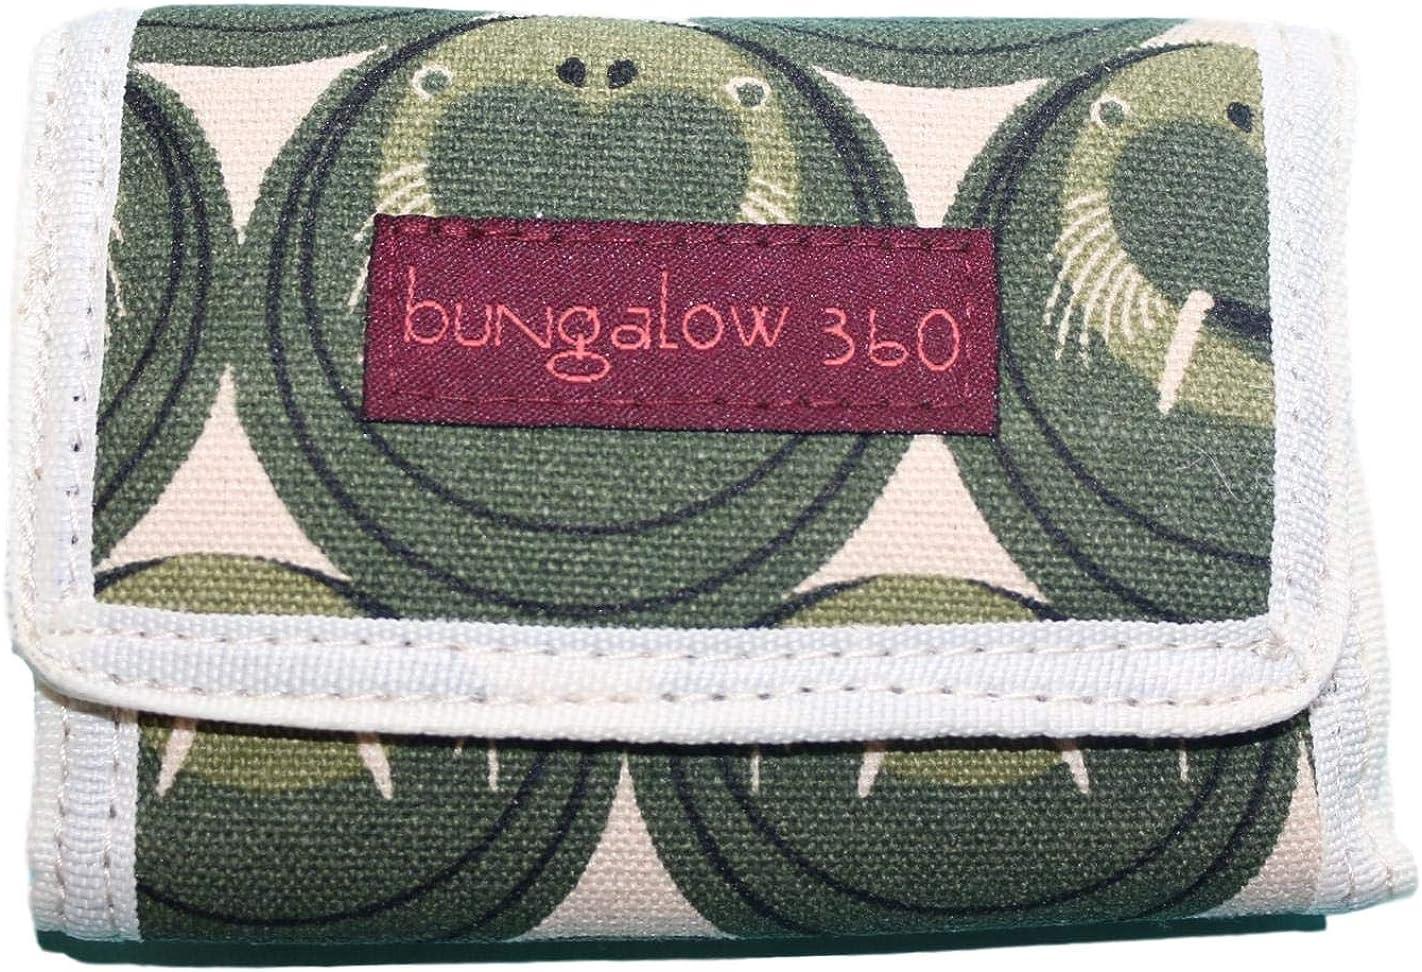 Bungalow 360 Trifold Vegan...